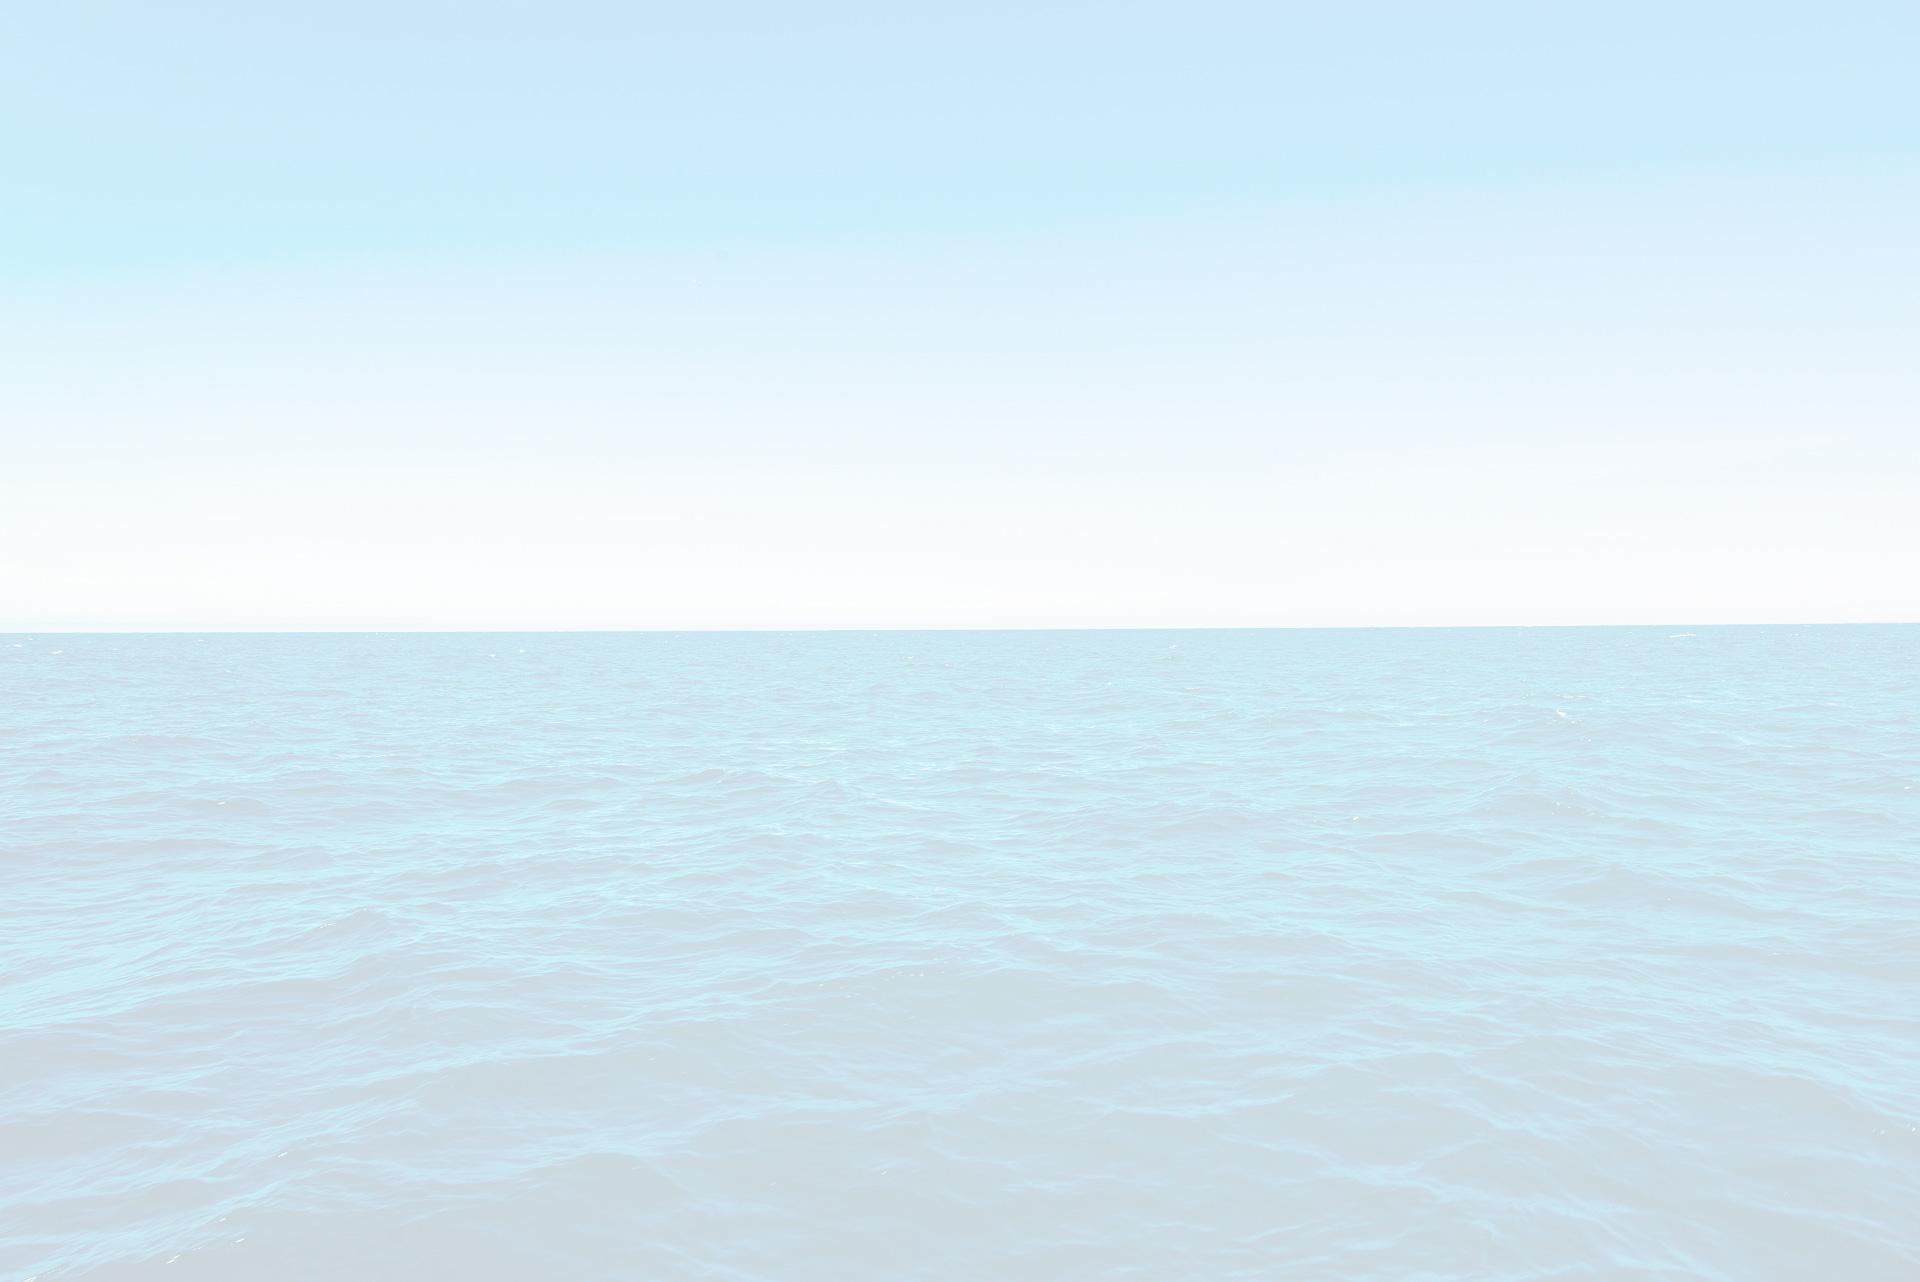 the_endless_sea_1920x1080